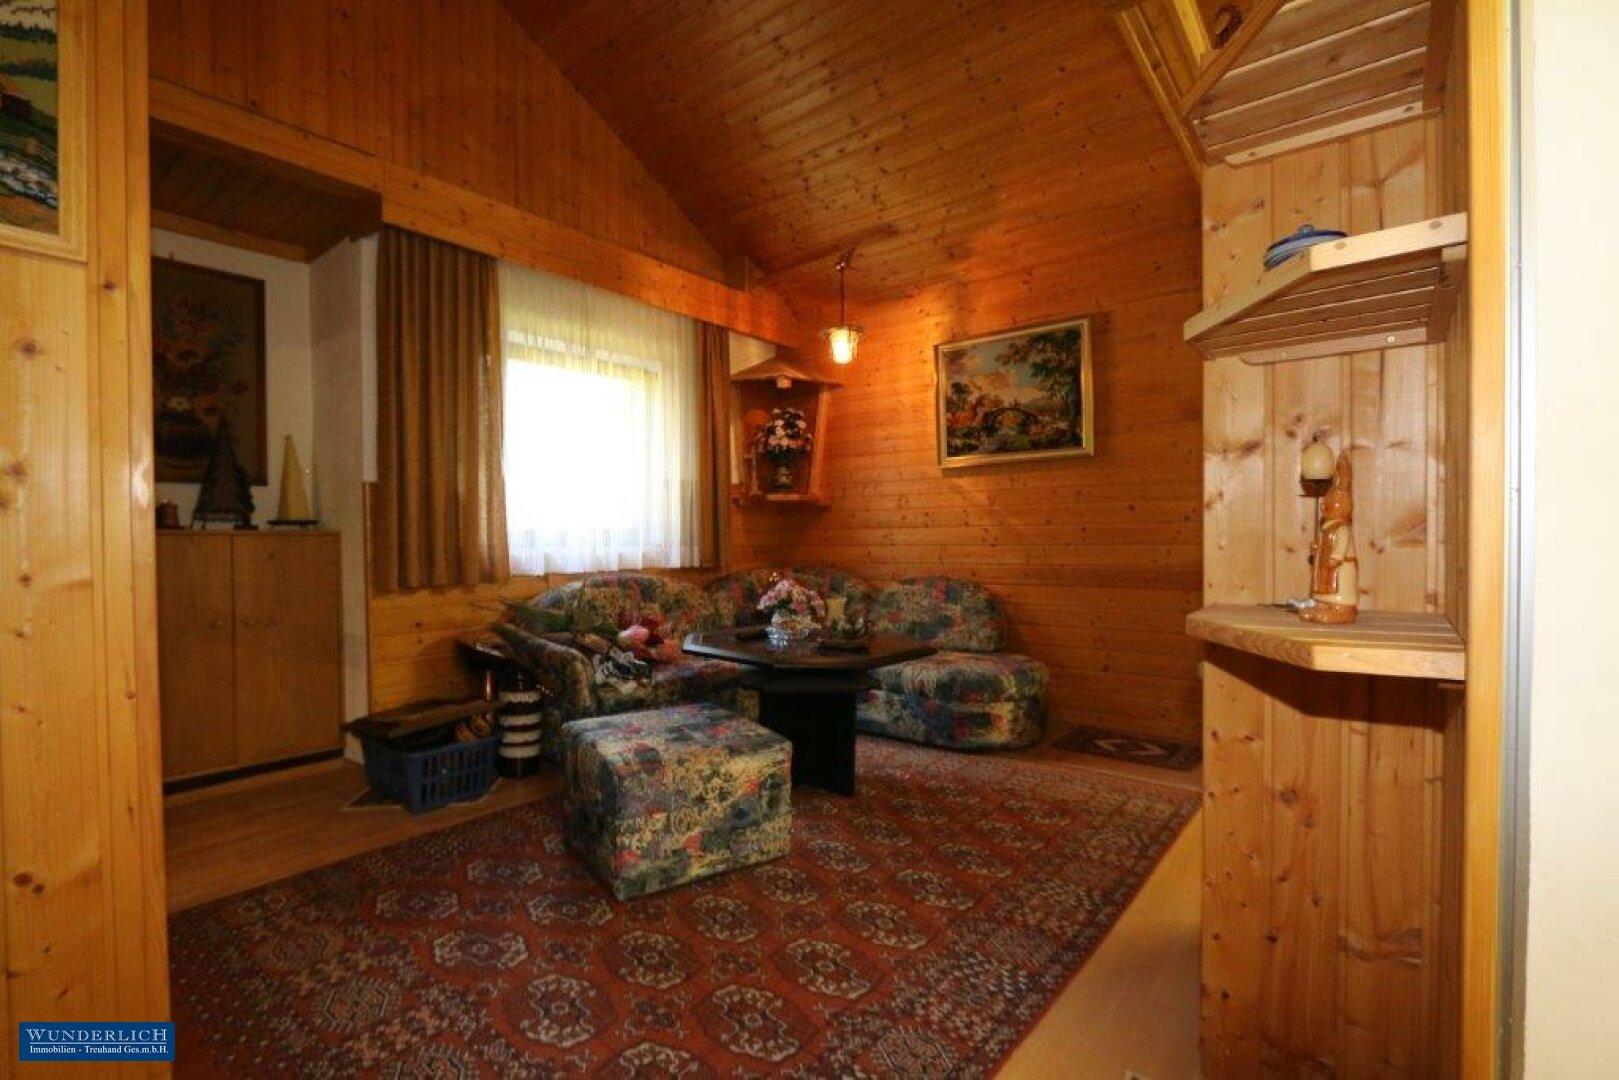 Studio im Dachgeschoß